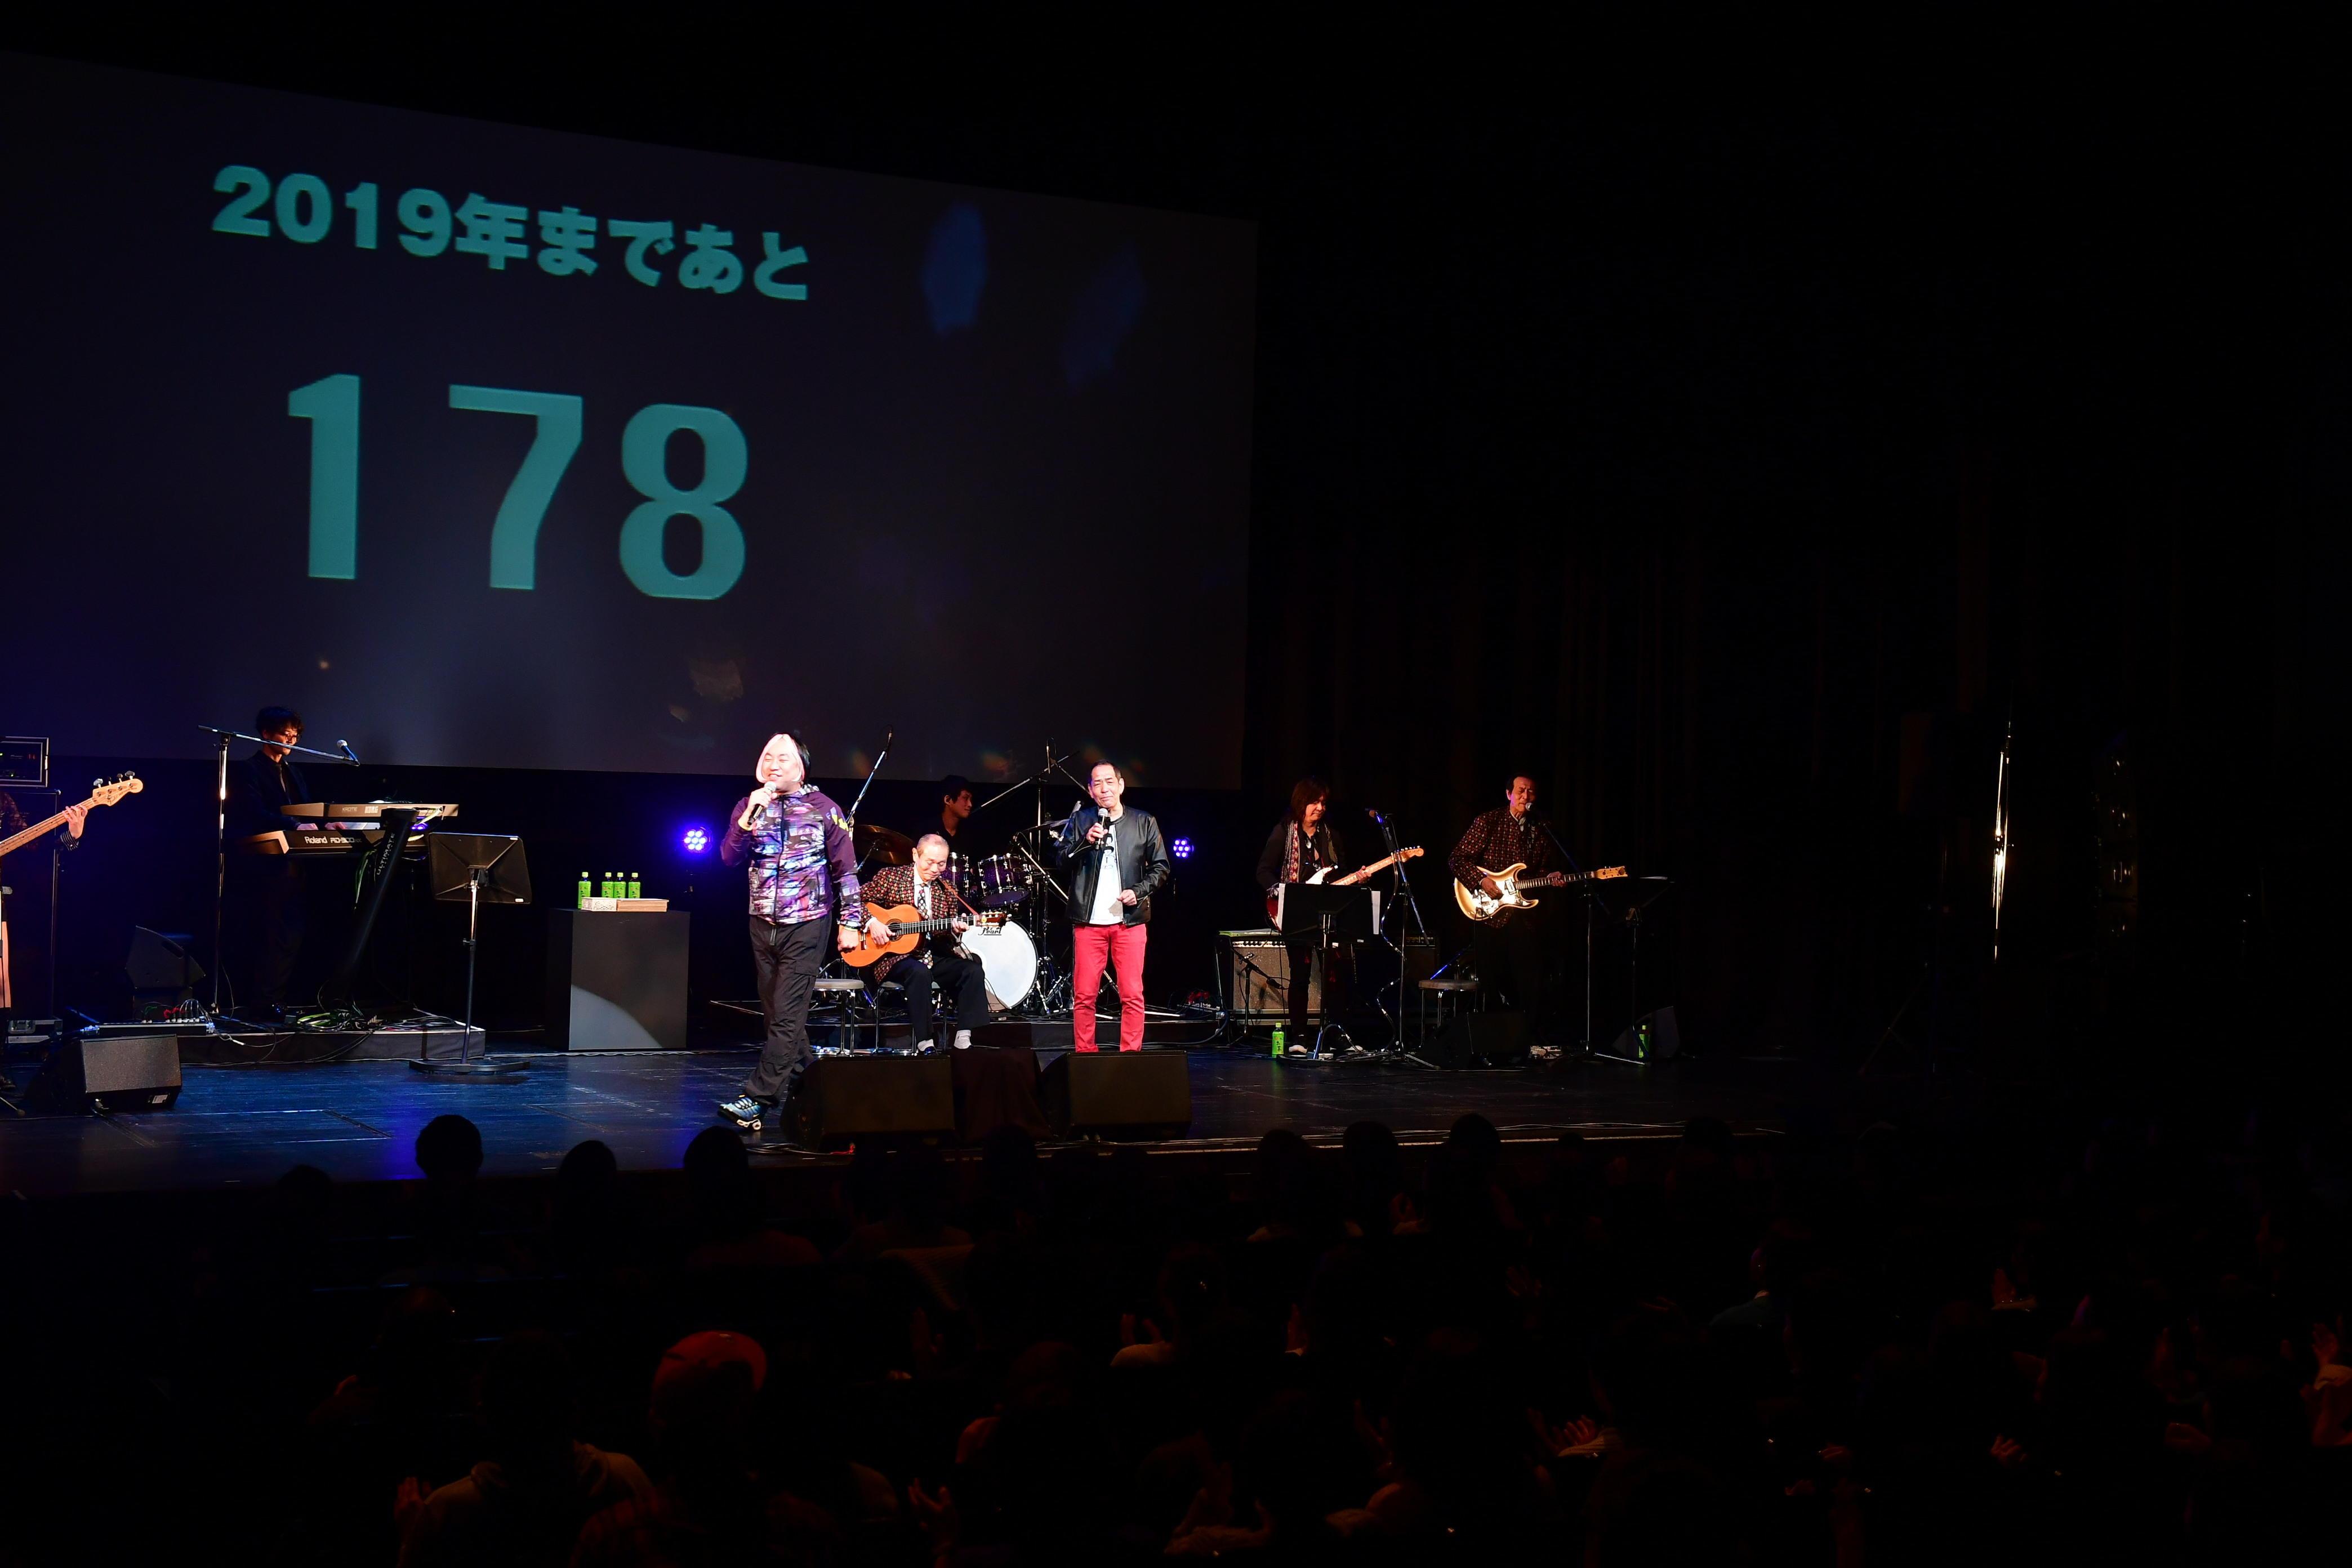 http://news.yoshimoto.co.jp/20190101134231-f888380361c14479503b1a8e853cdef8804b506b.jpg